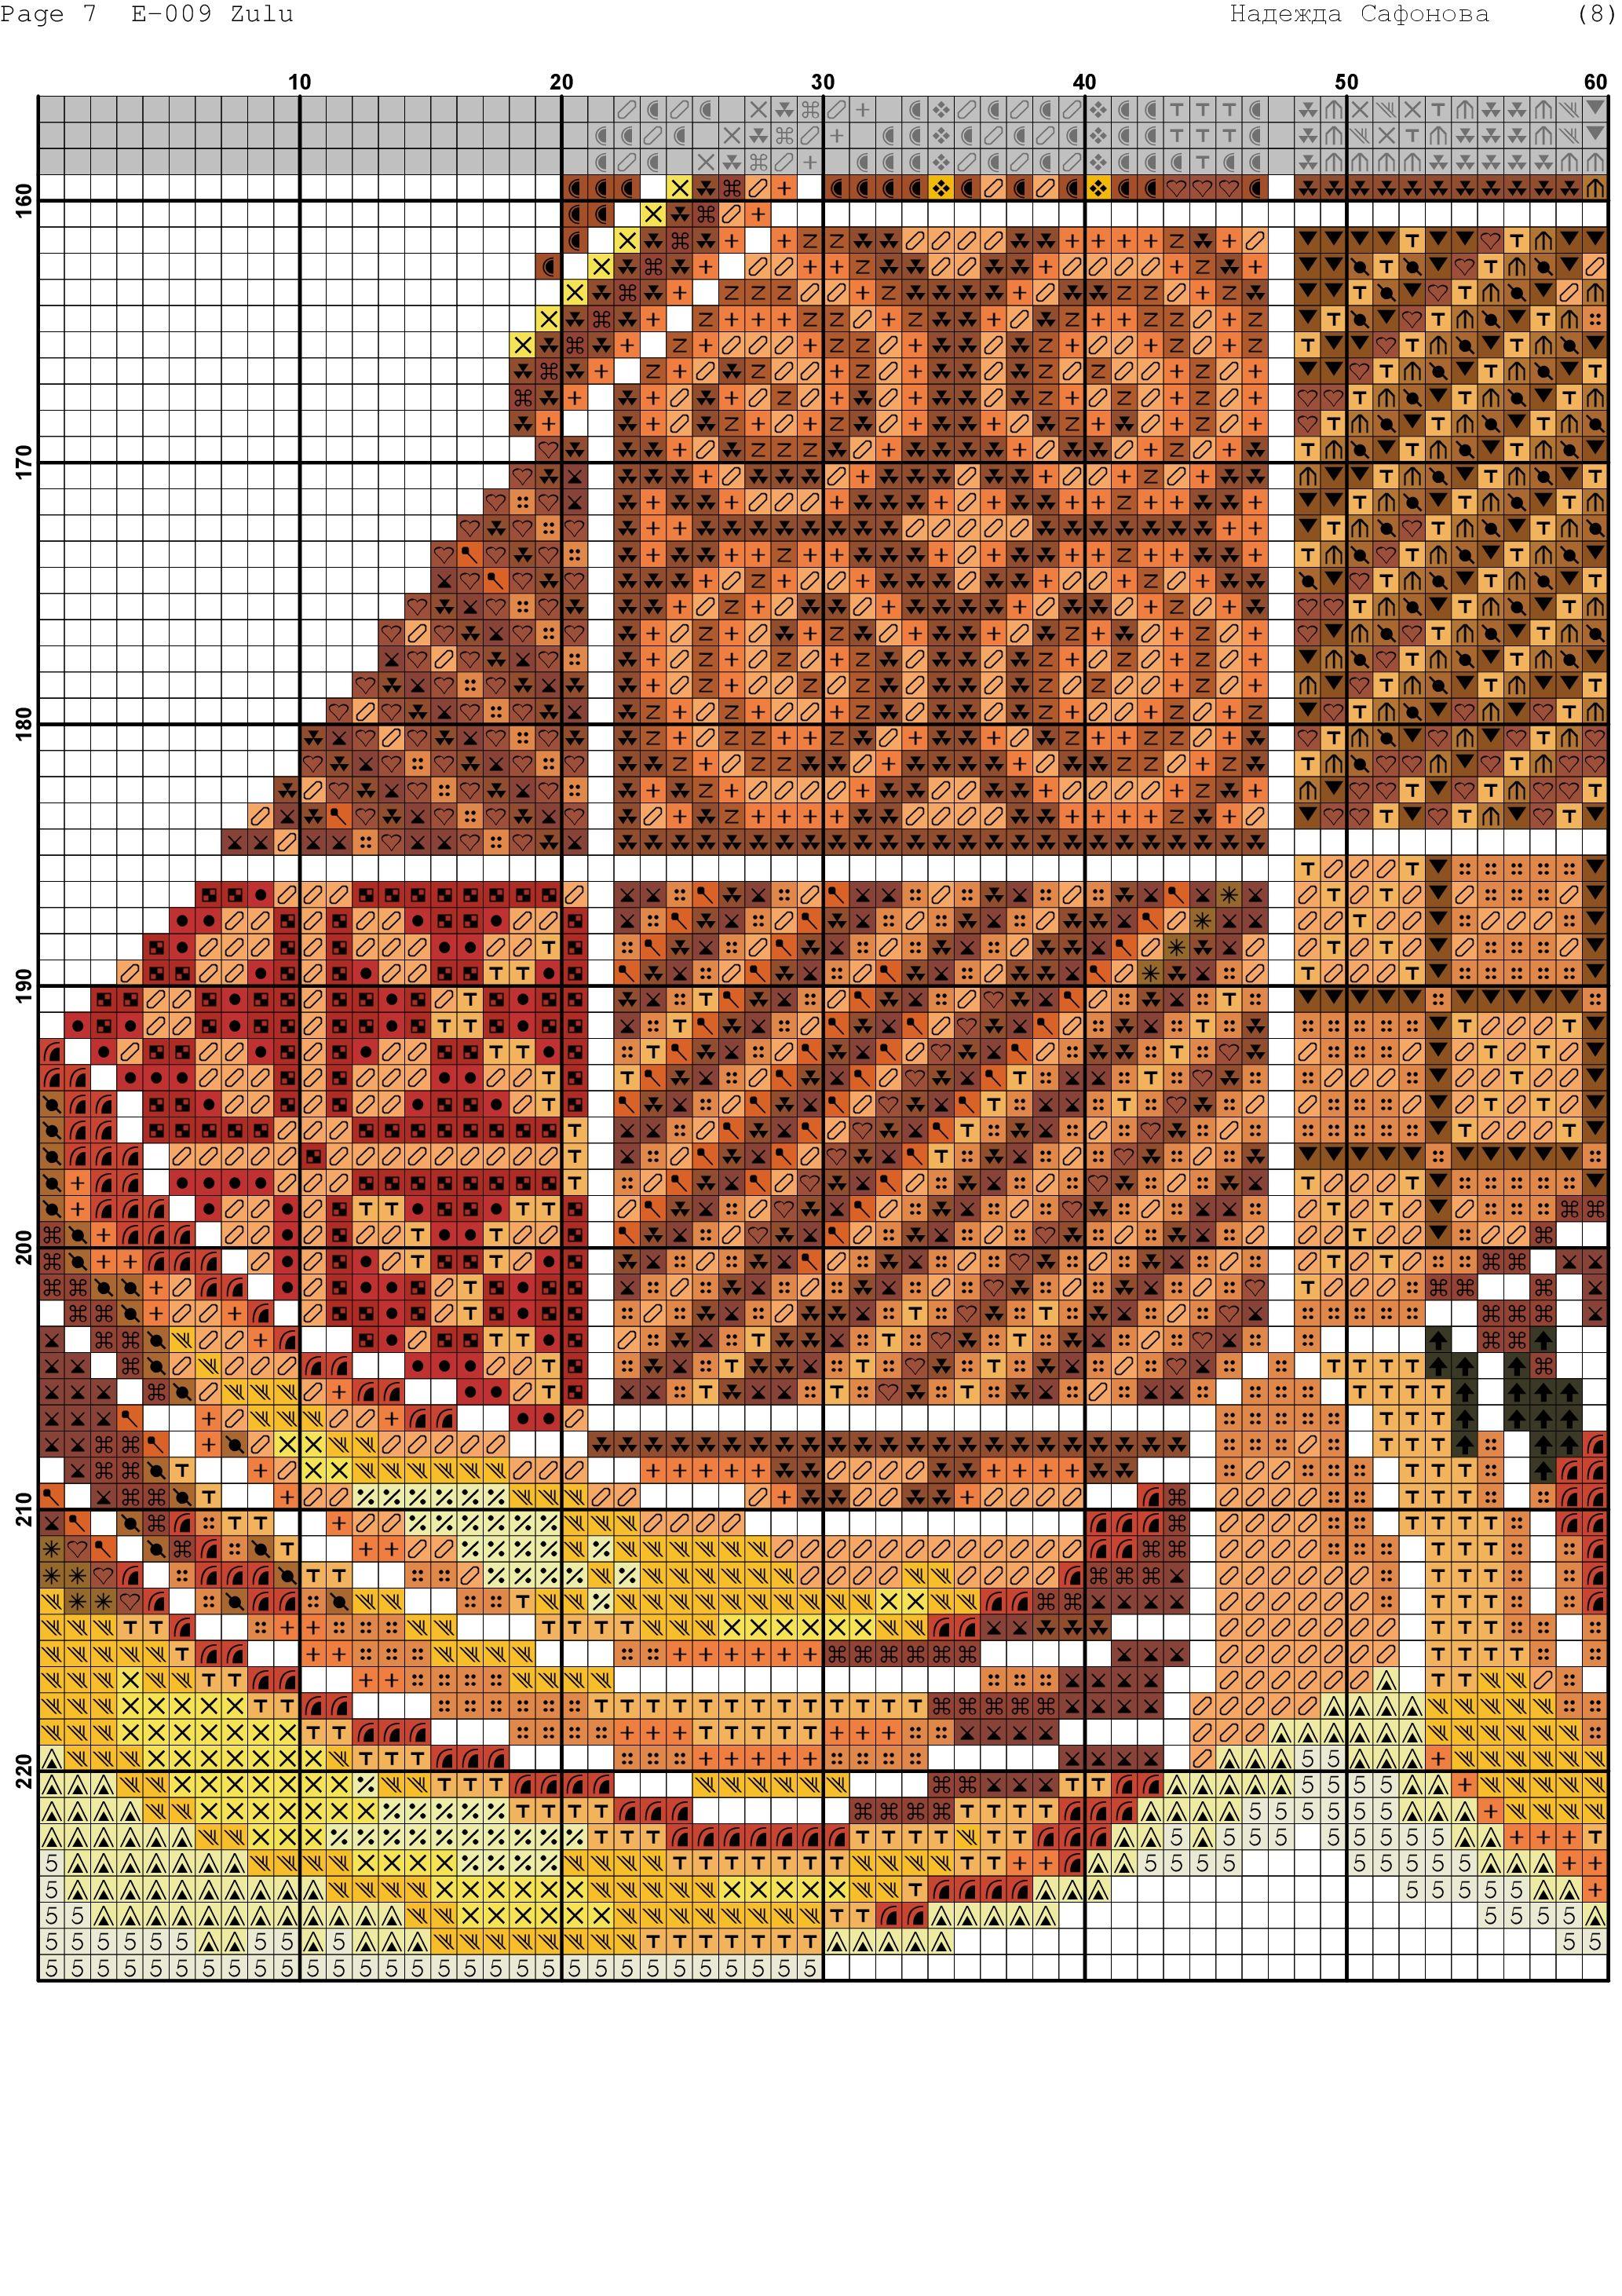 Pin de Sheri Brabyn en Sewing | Pinterest | Africanos, Cuadros ...